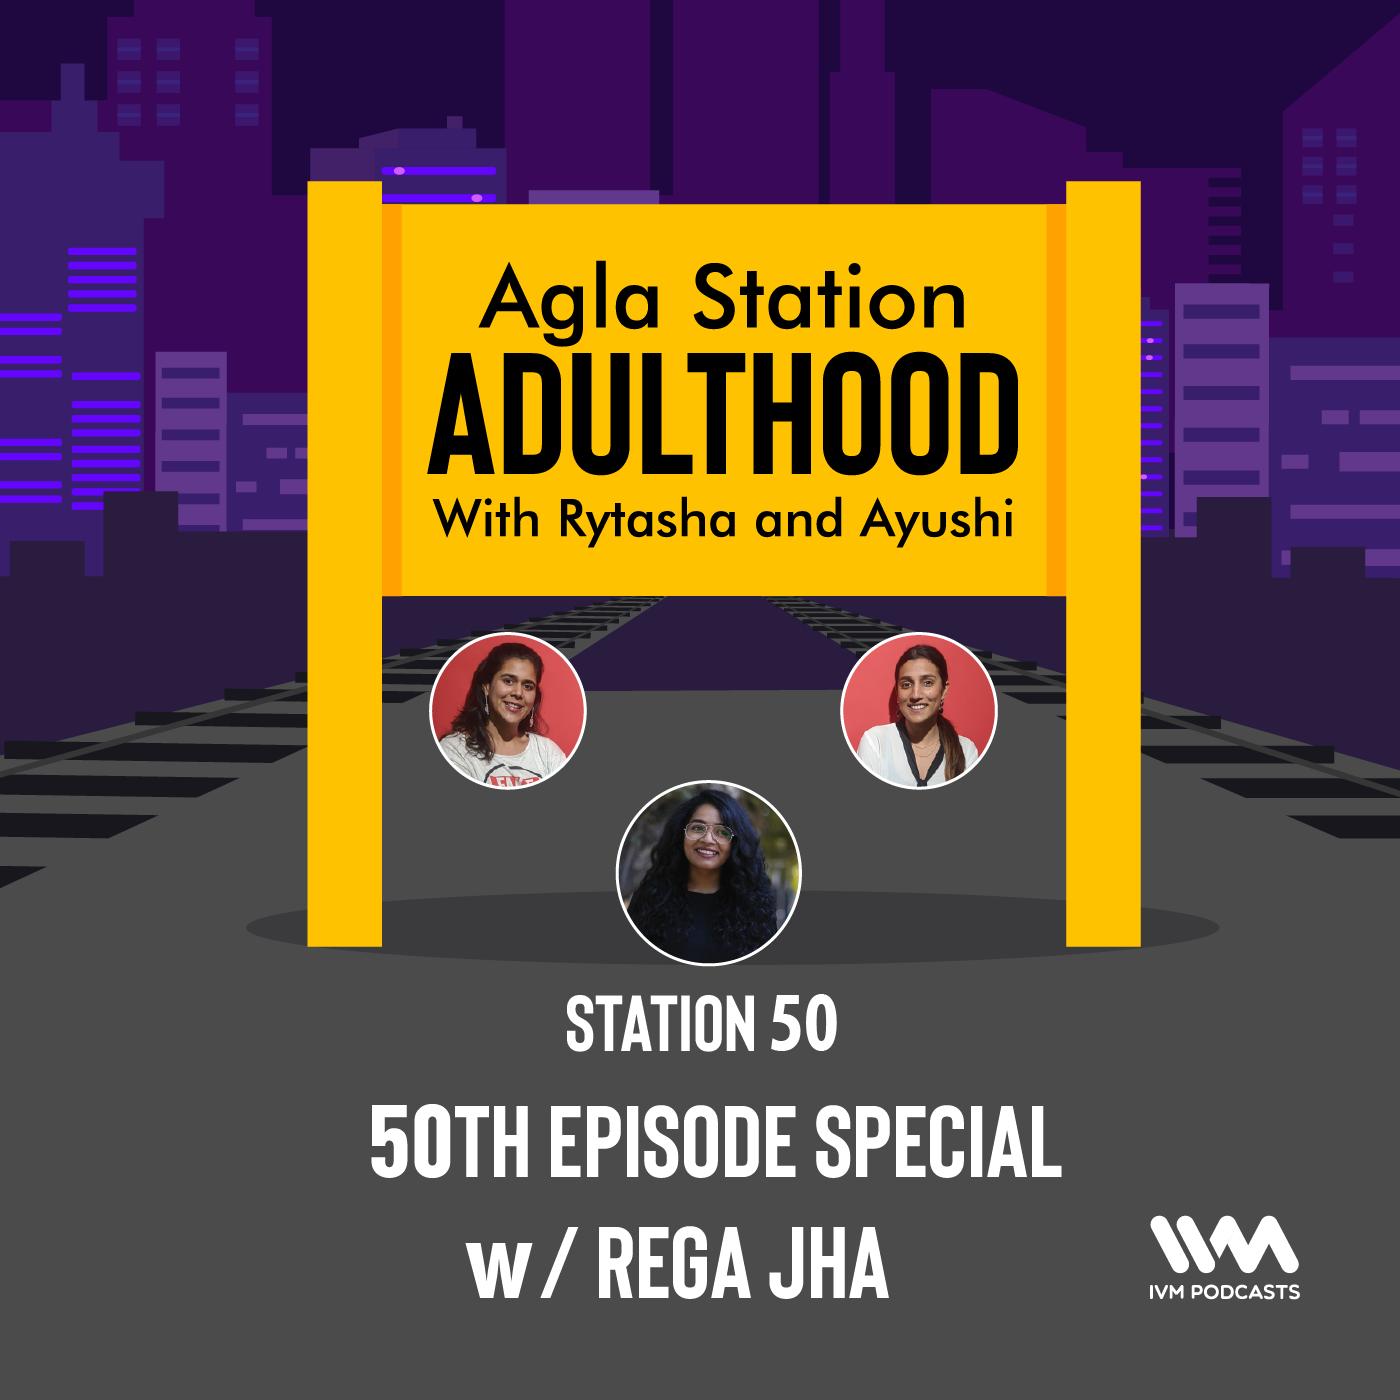 Ep. 50: 50th Episode Special w/ Rega Jha